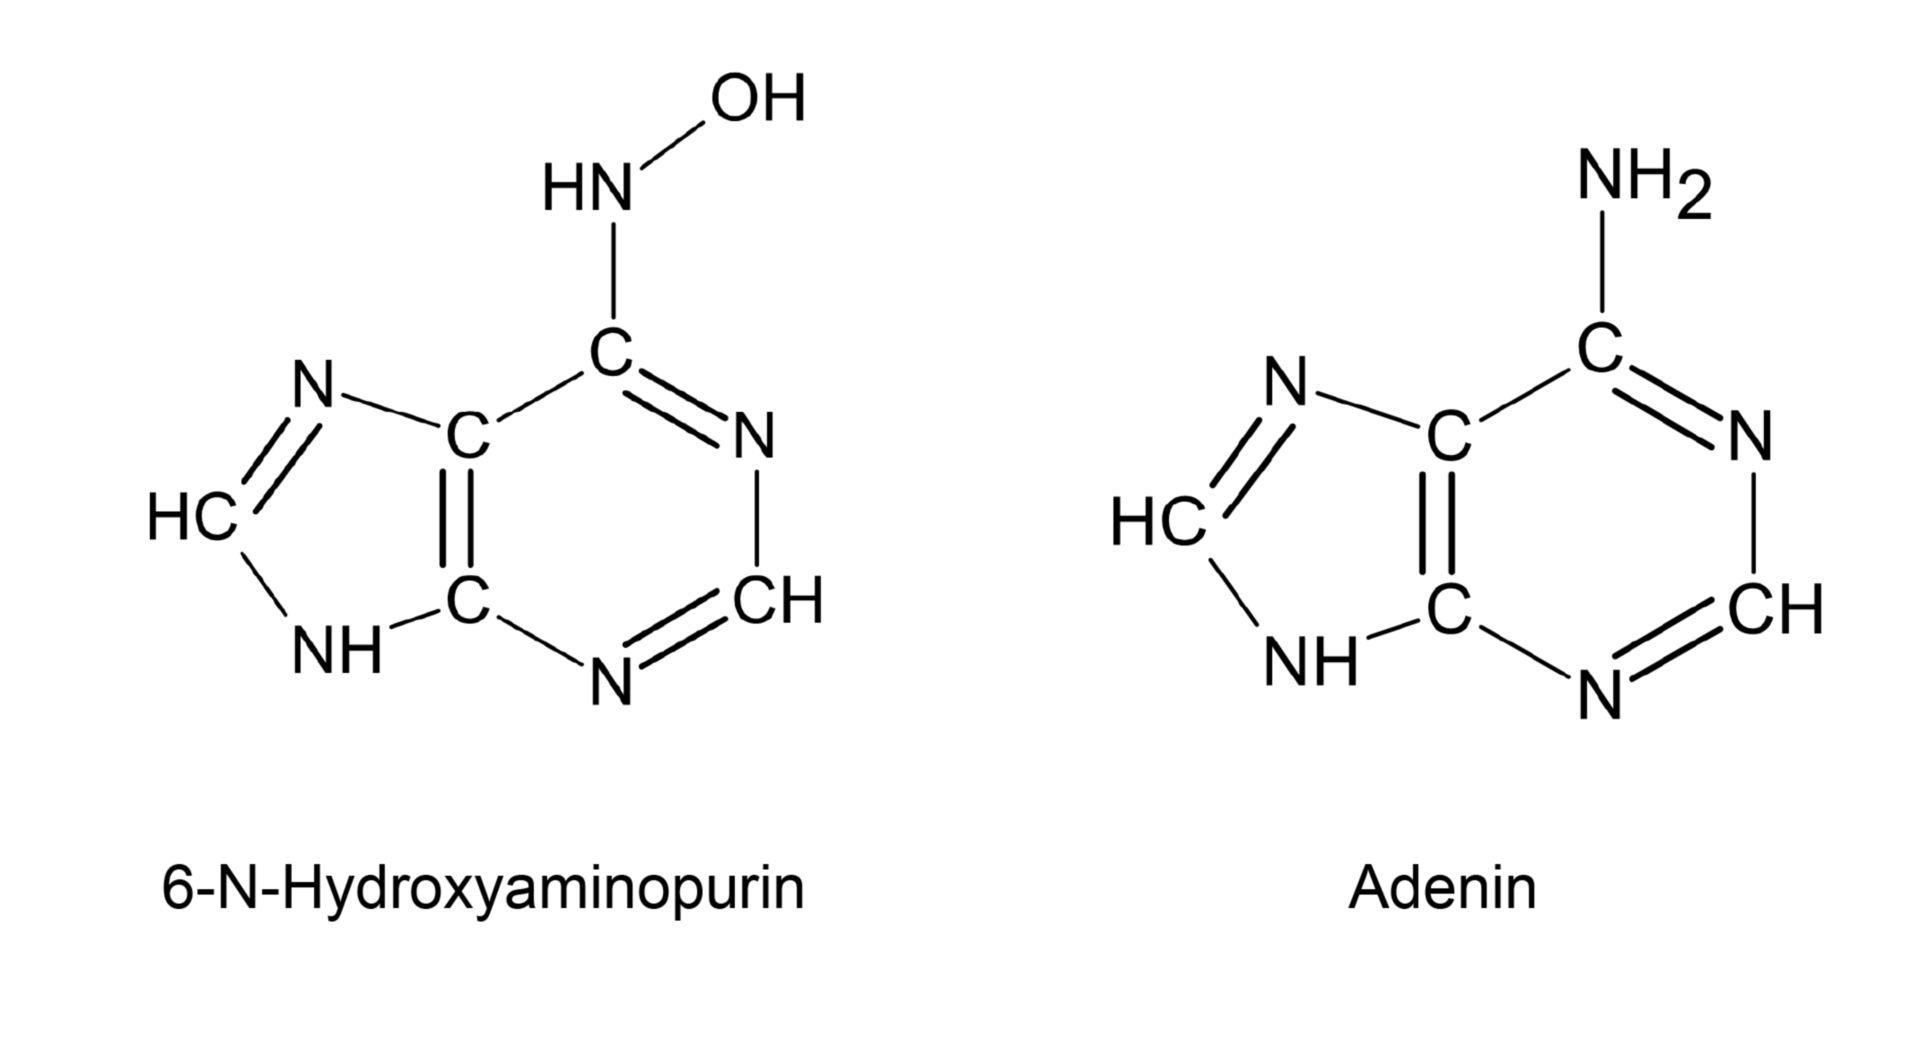 6-N-Hydroxyaminopurin